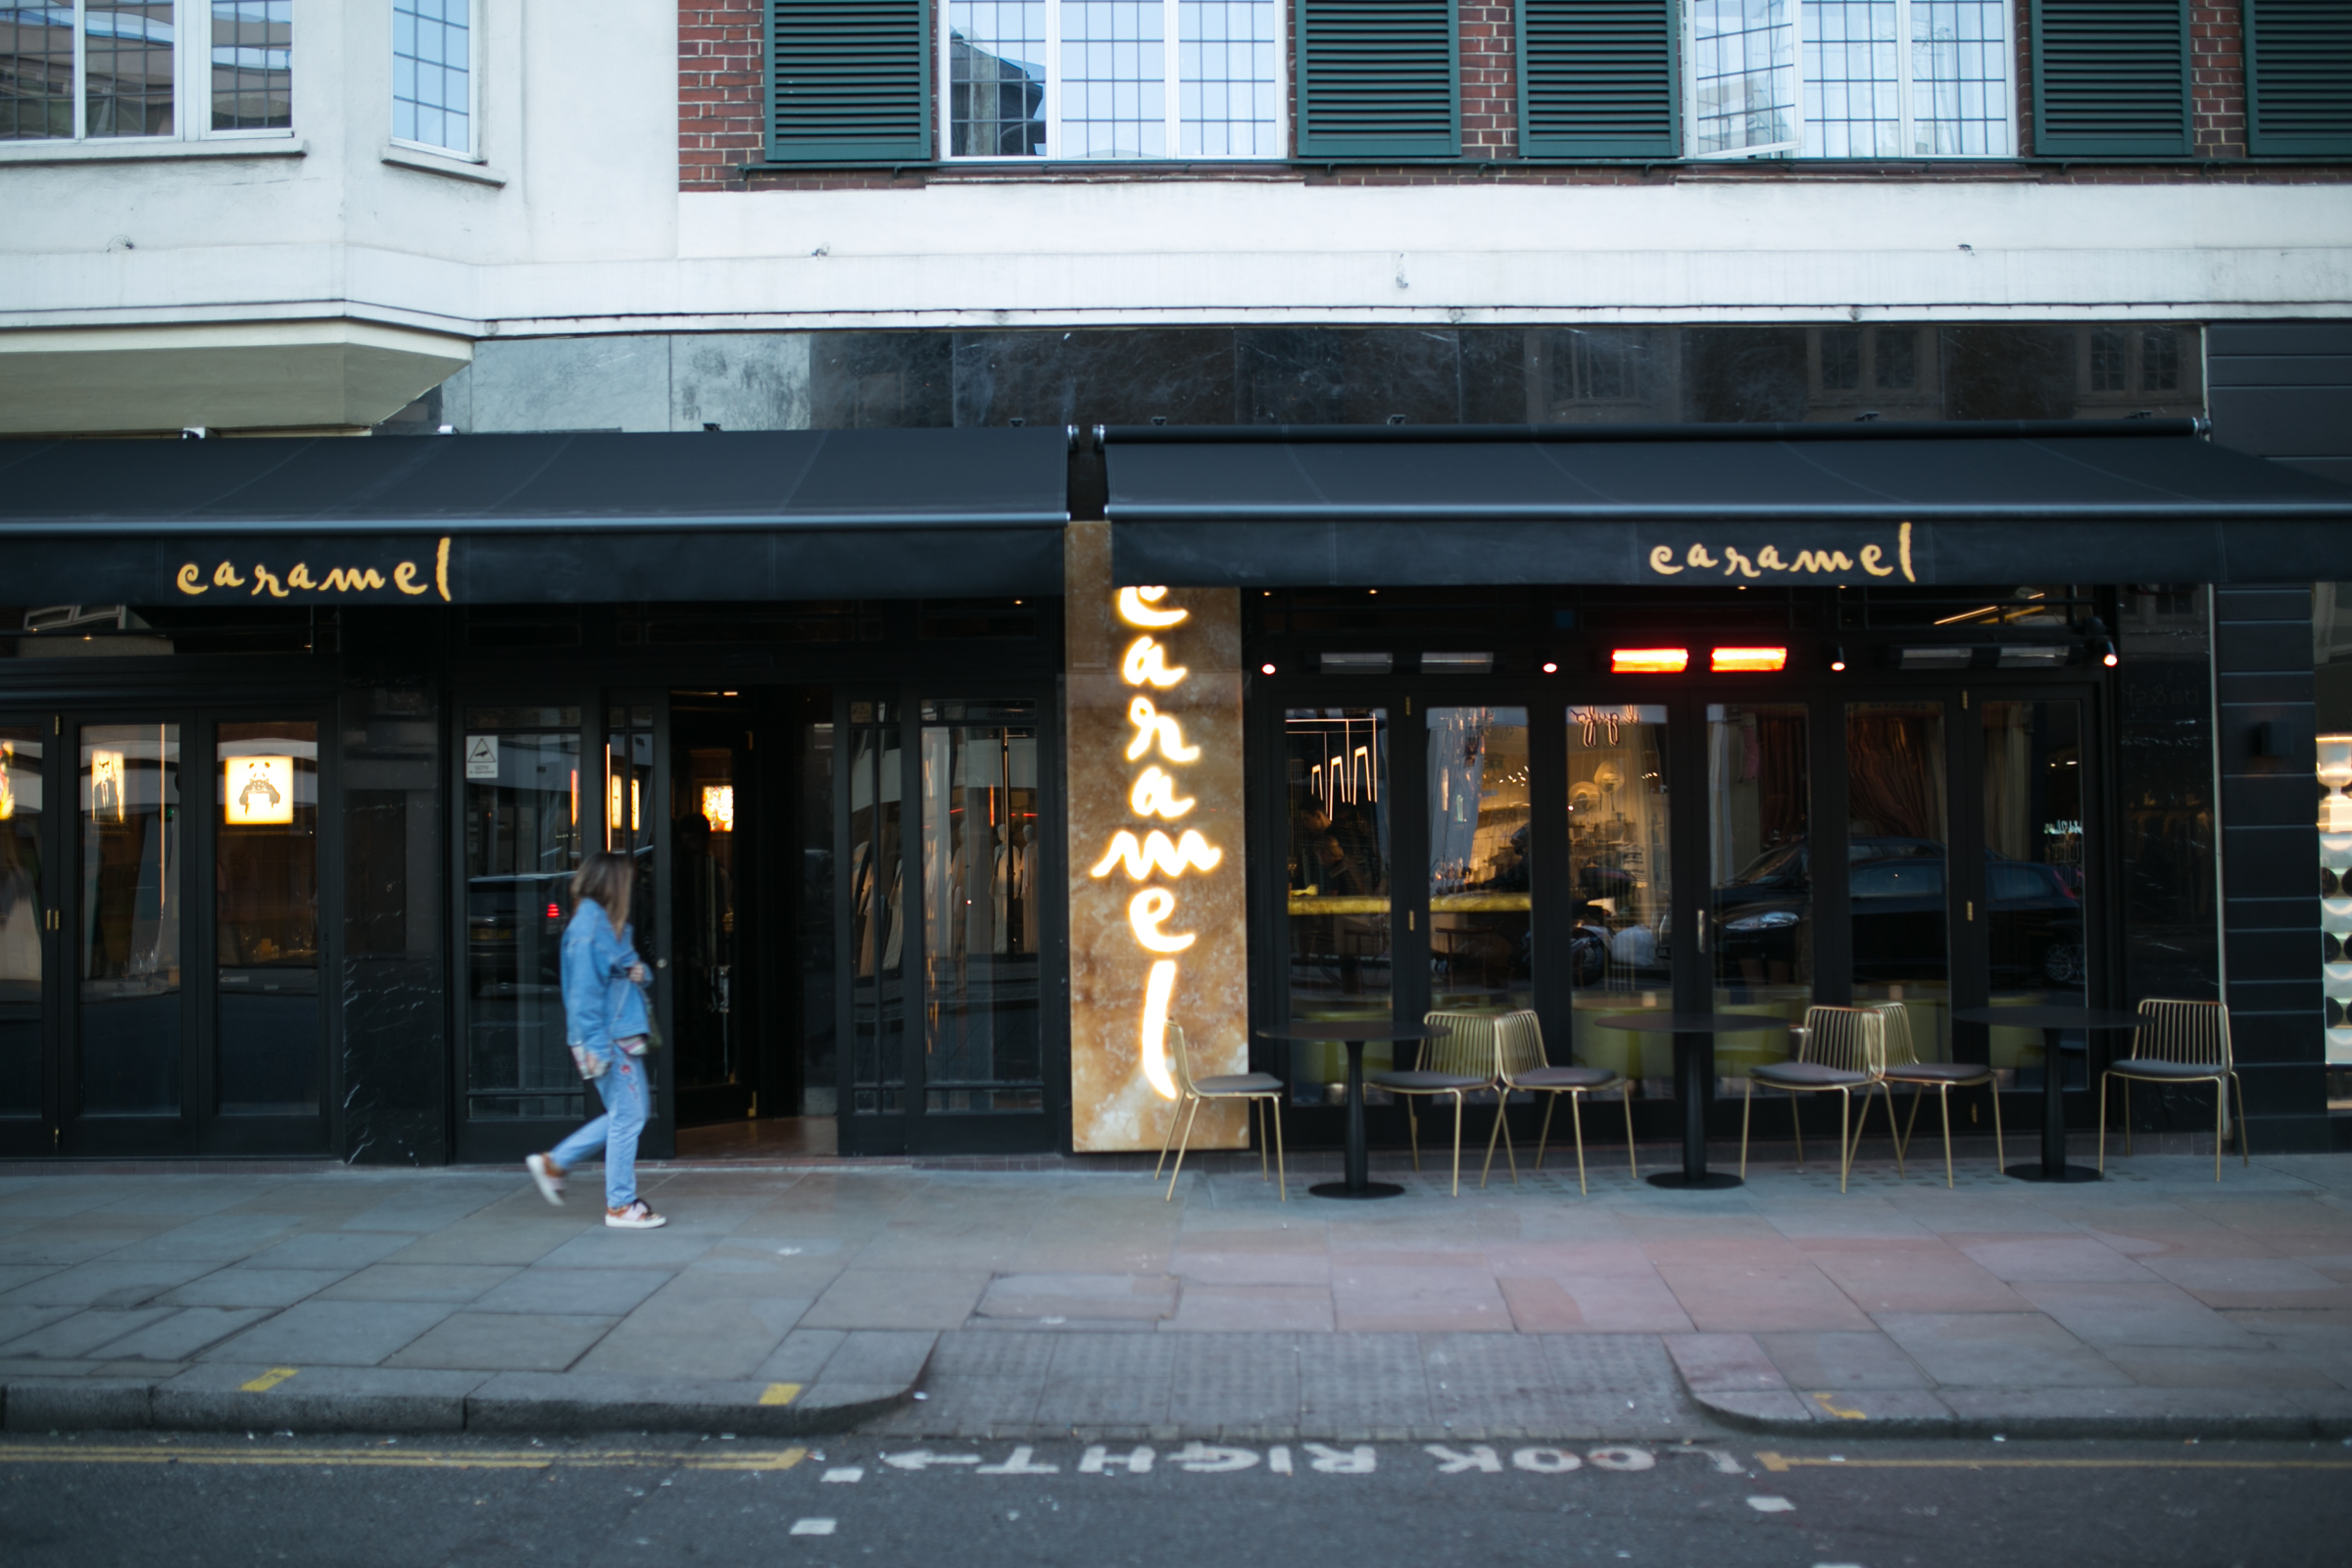 Caramel-restaurant-and-lounge-london-abu-dabi-dubai-oman-new-restaurant-in-london-minas-planet-review-jasmina-haskovic11.jpg